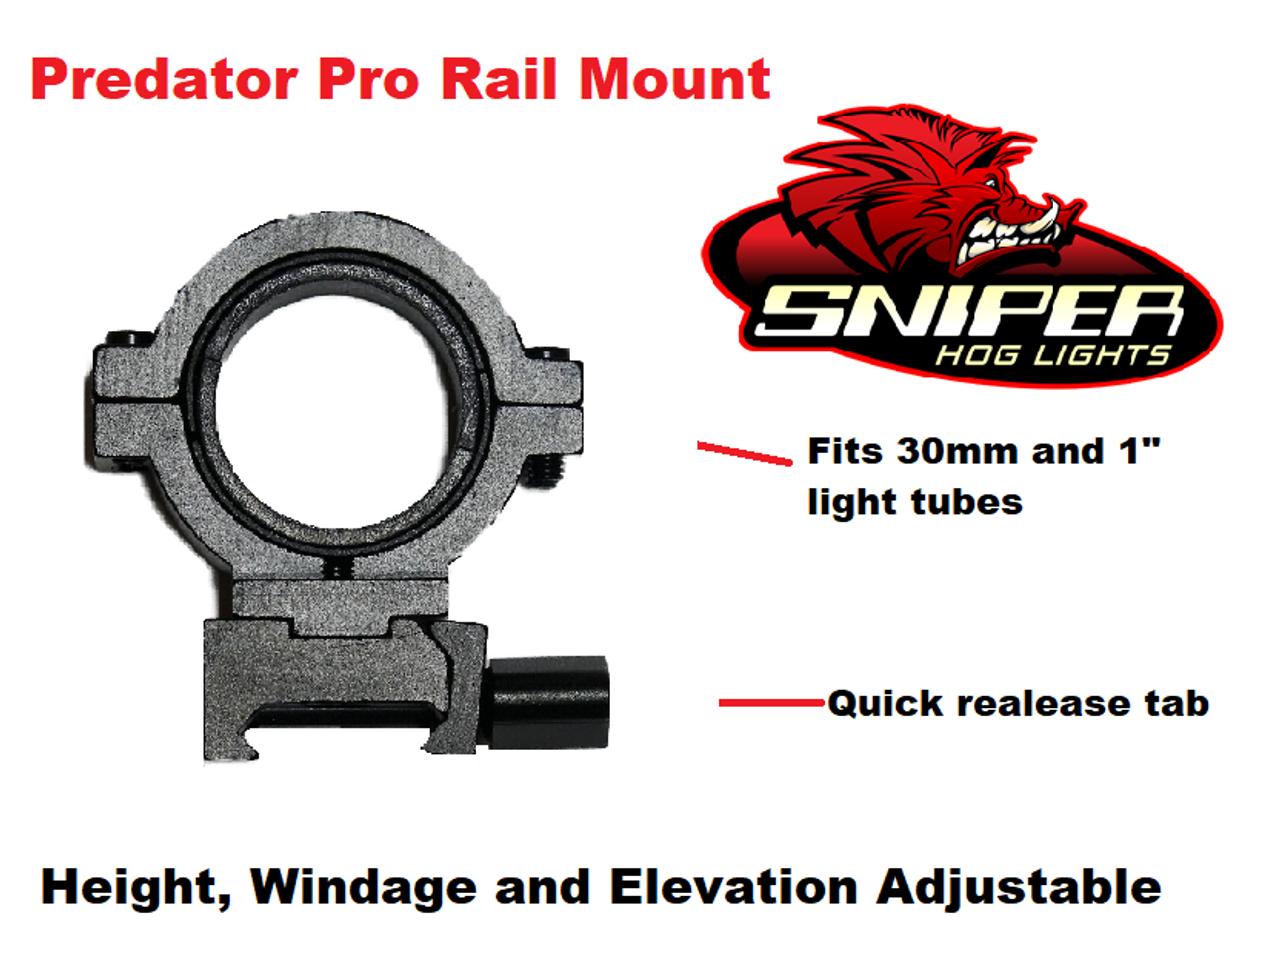 Predator Pro Rail Mount